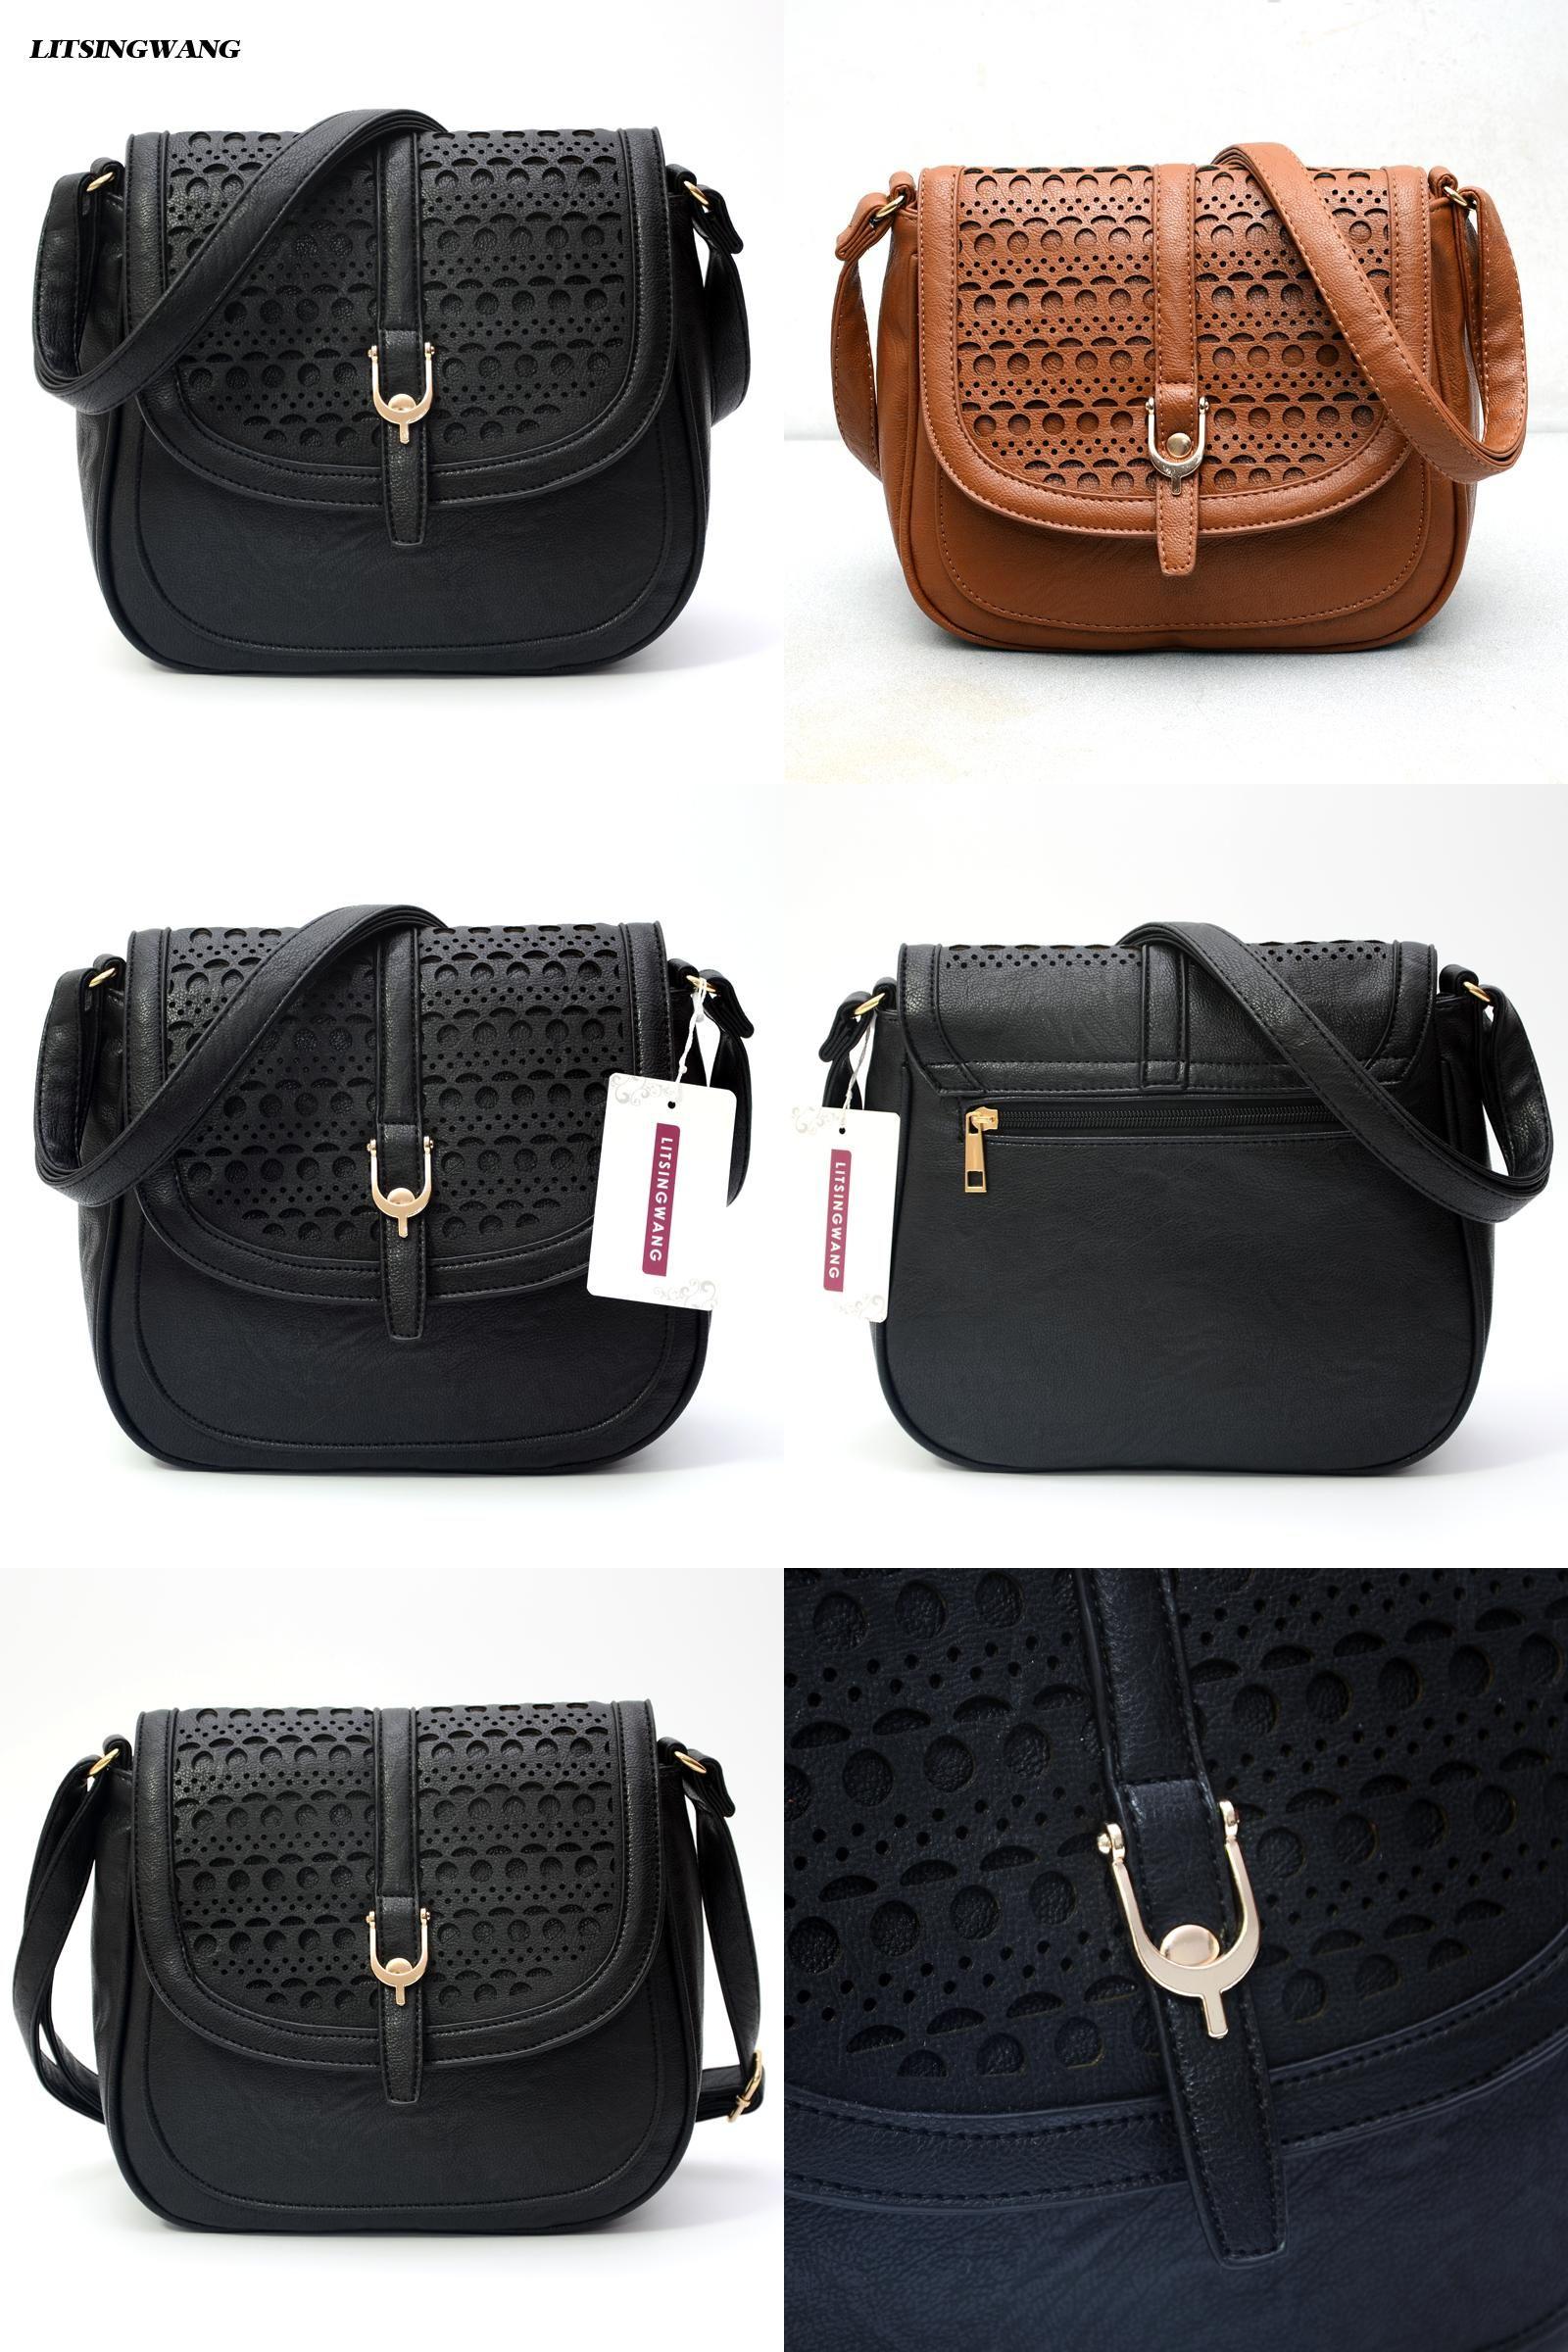 643807b31b  Visit to Buy  LITSINGWANG new crossbody bags for women hollow out pu  shoulder handbags